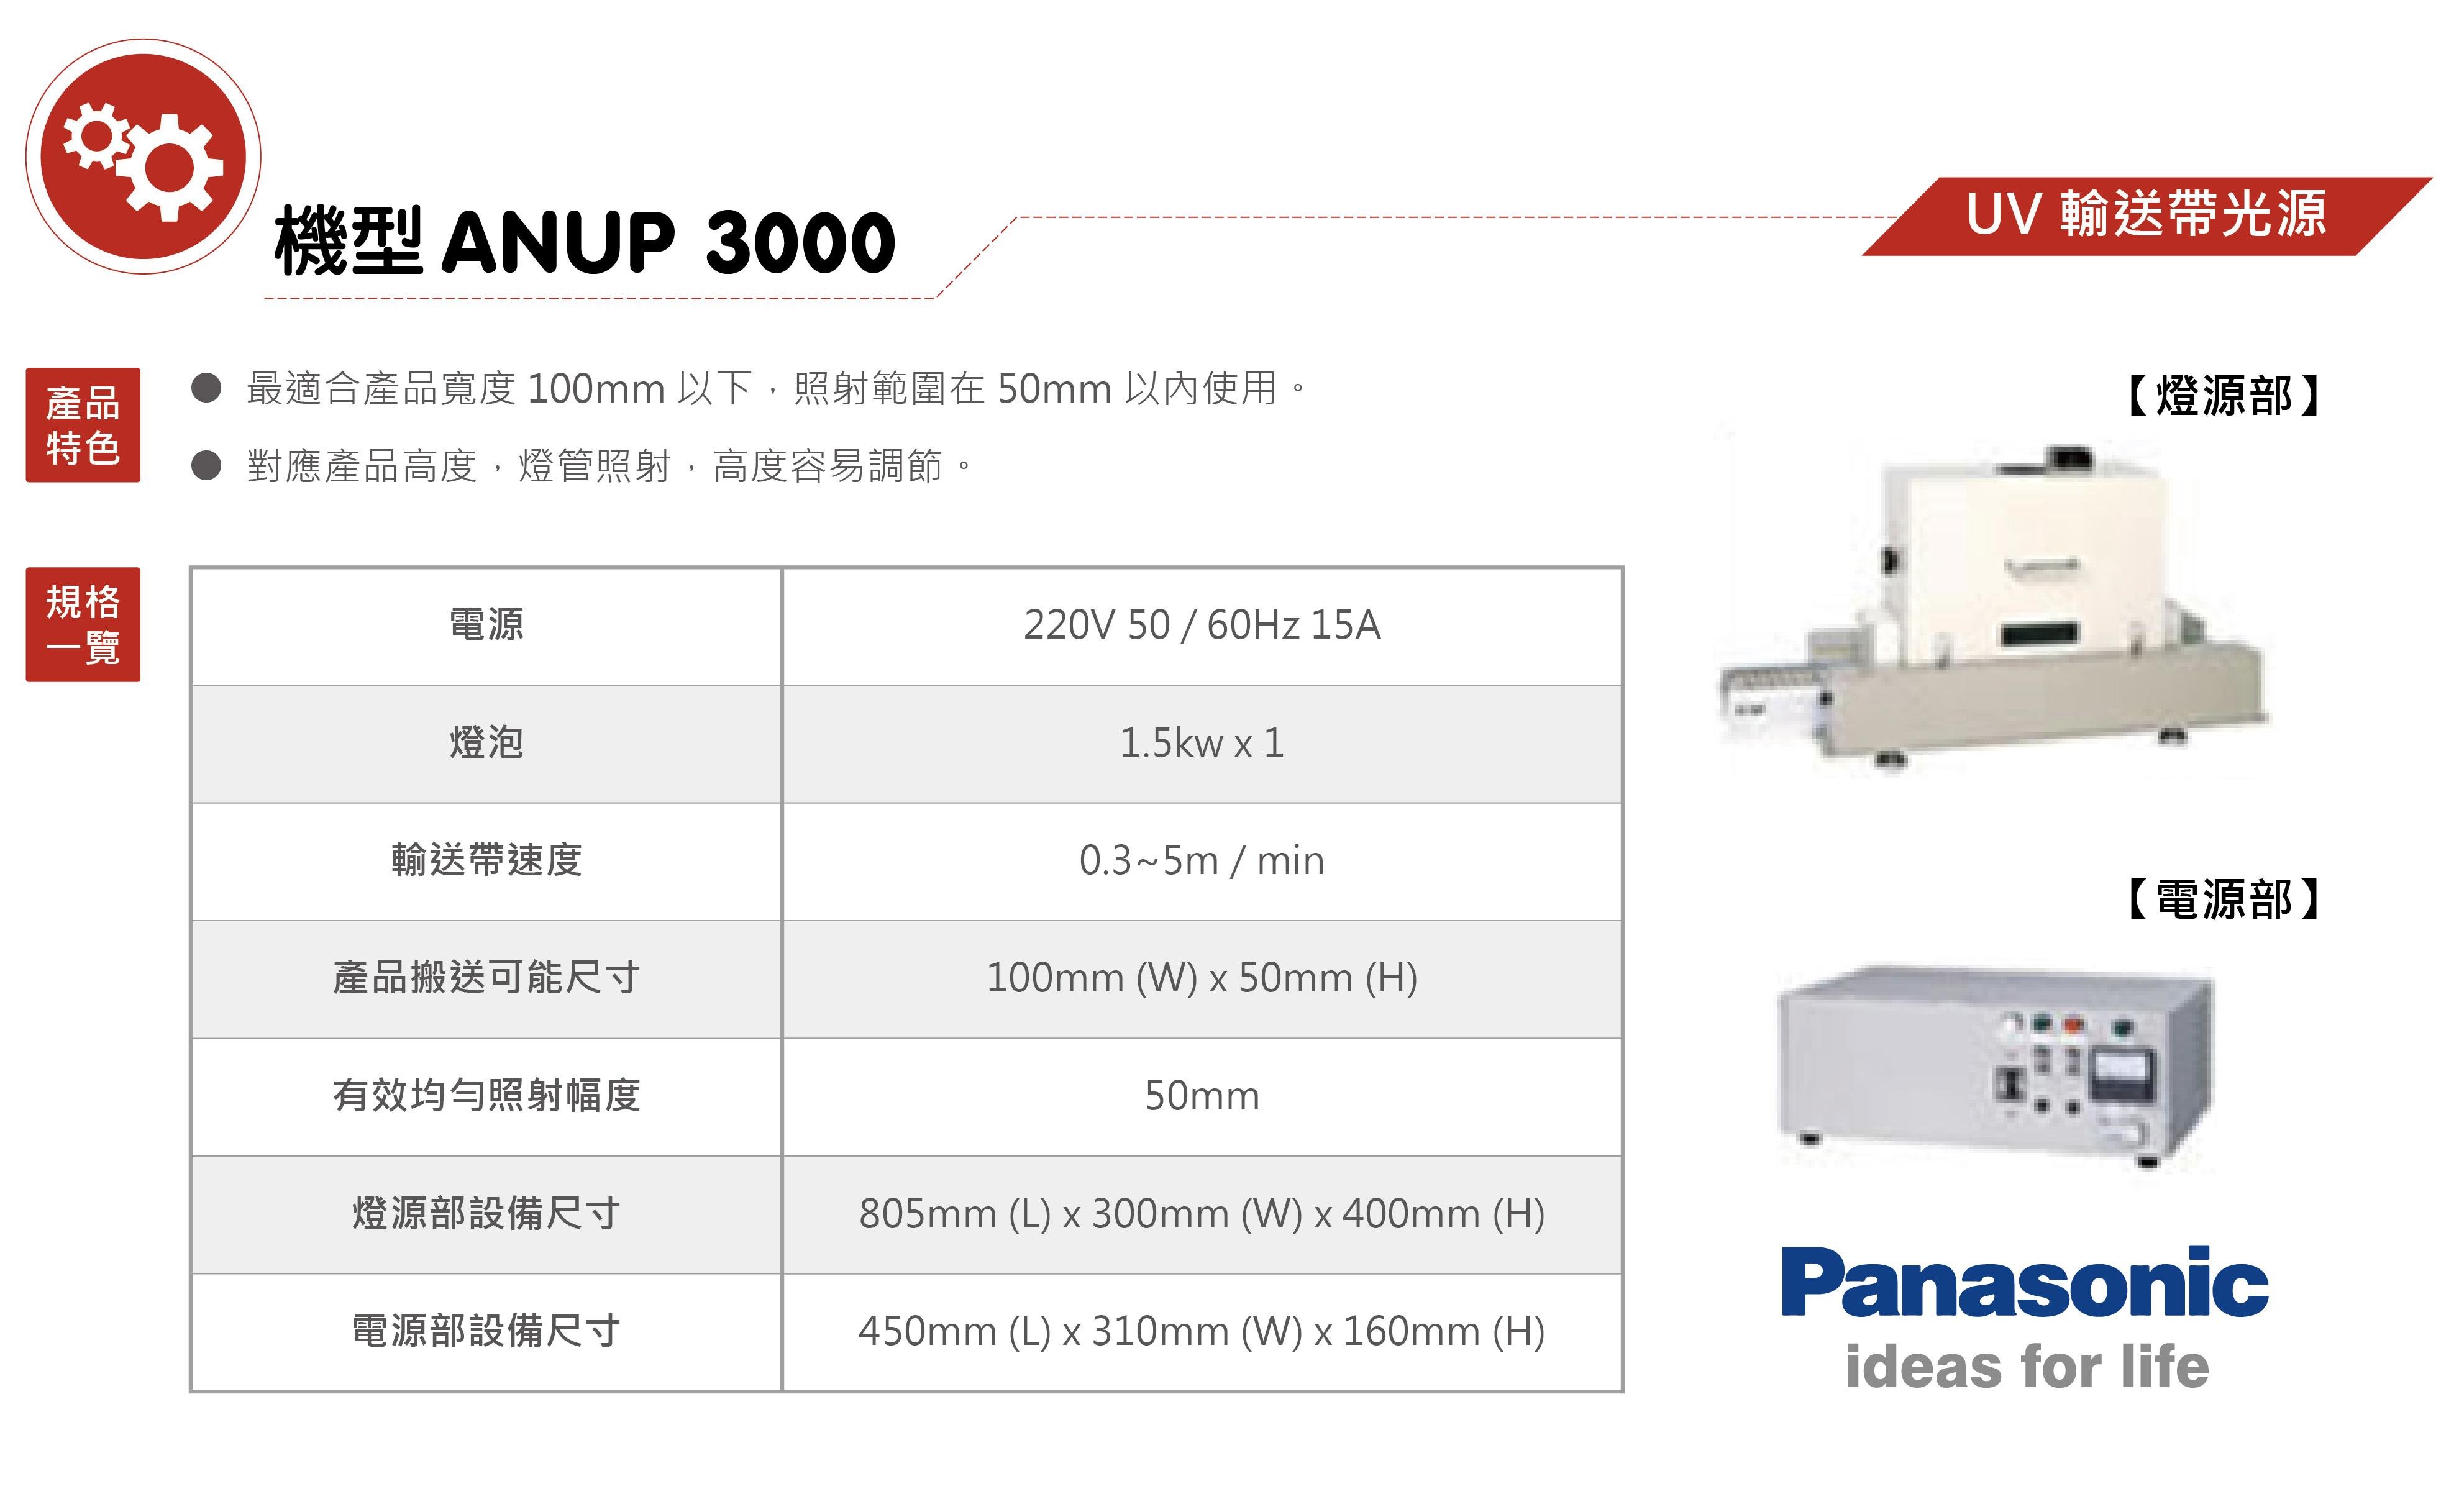 07-UV-輸送帶光源-機型ANUP-3000(UV點光源設備-輸送帶光源)_01